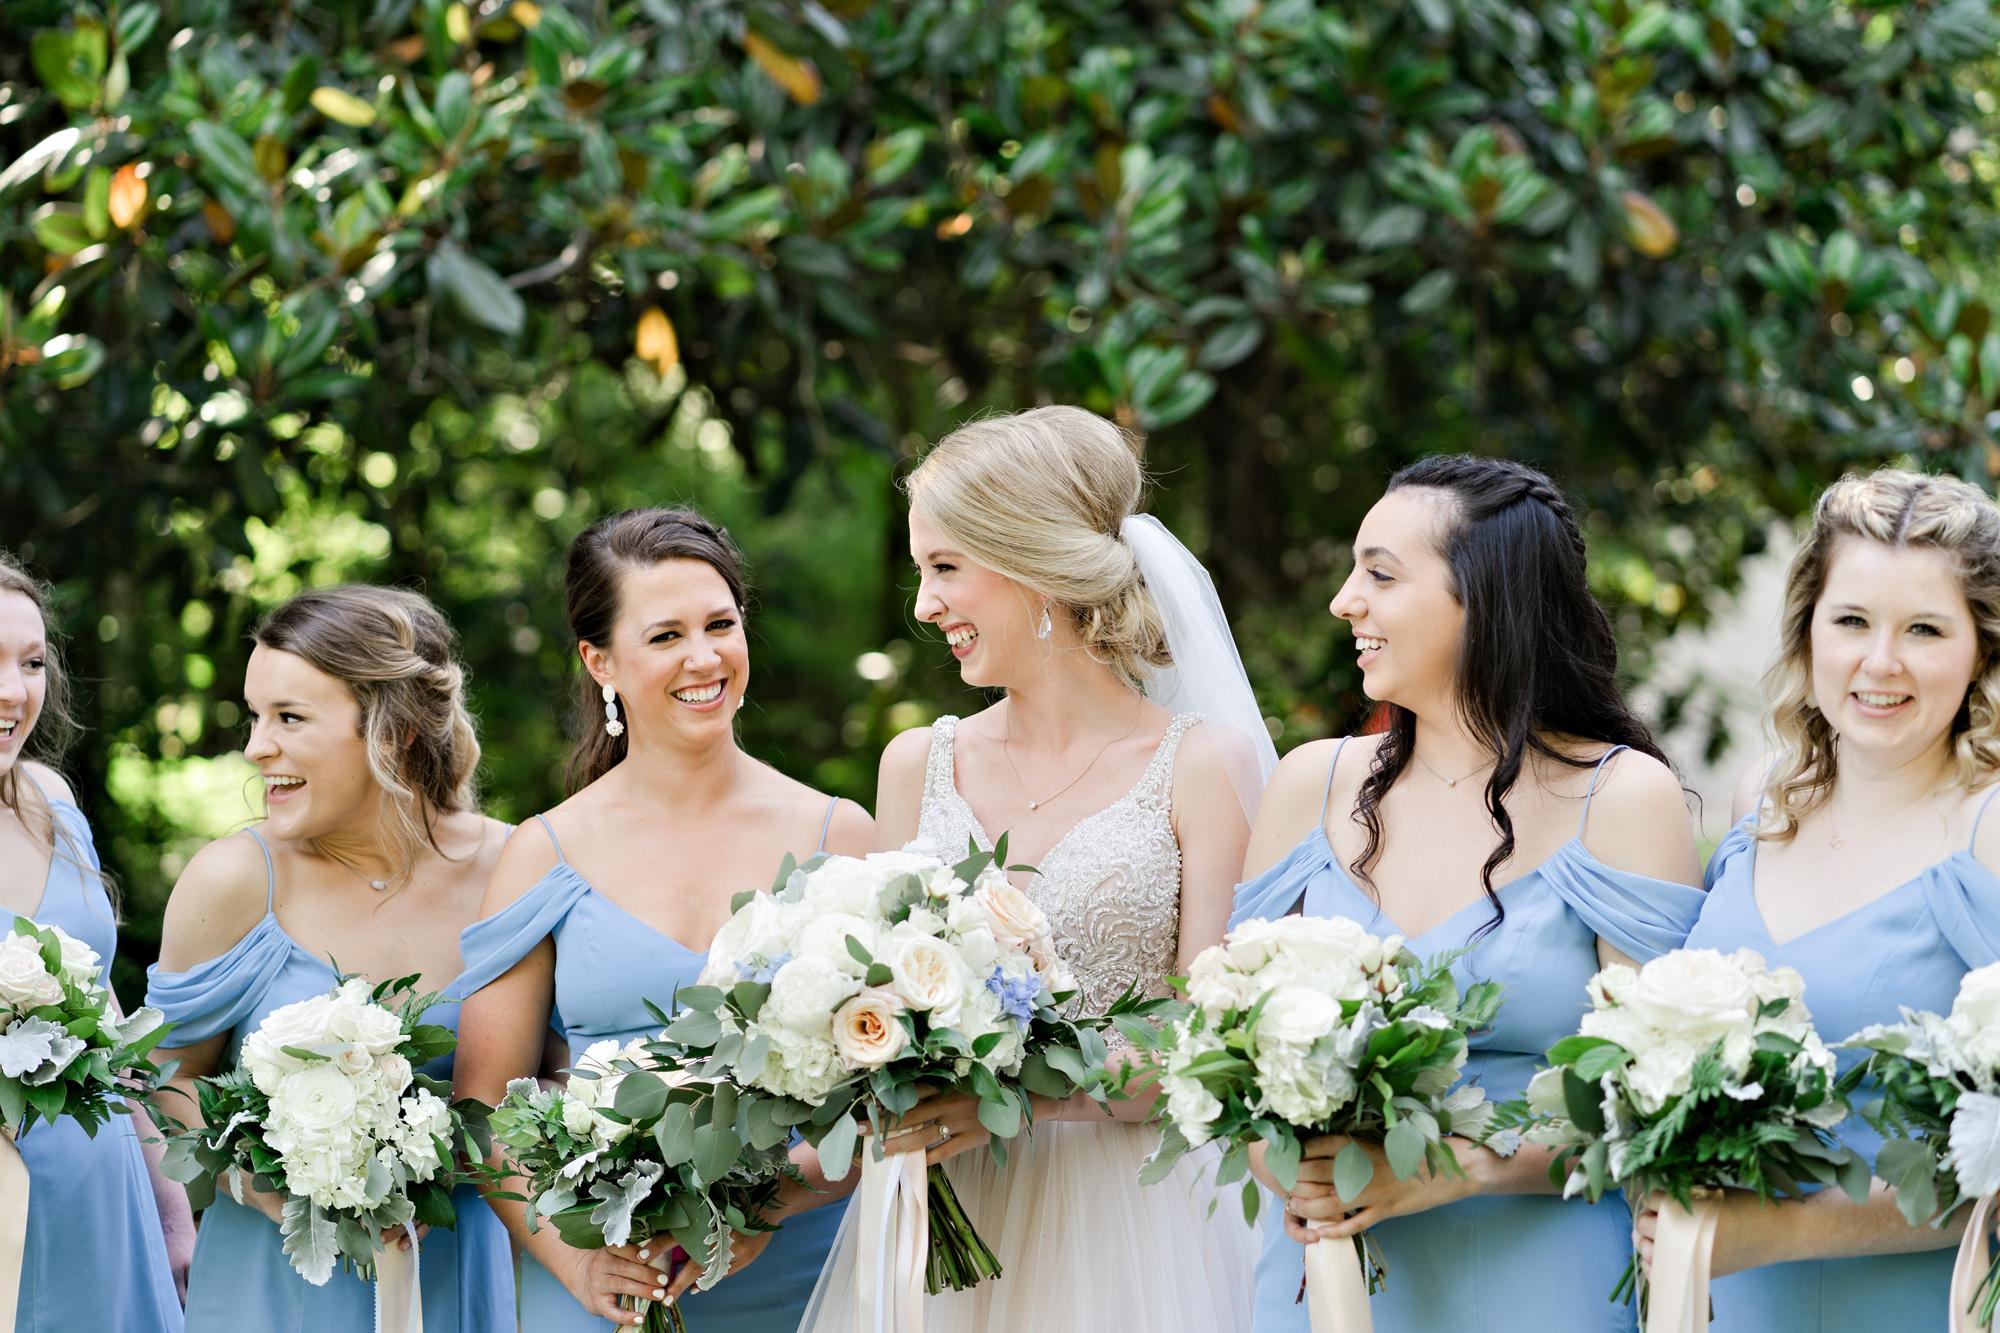 Alabama-Photographers-Nick-Drollette-Wedding-Photography-123.jpg